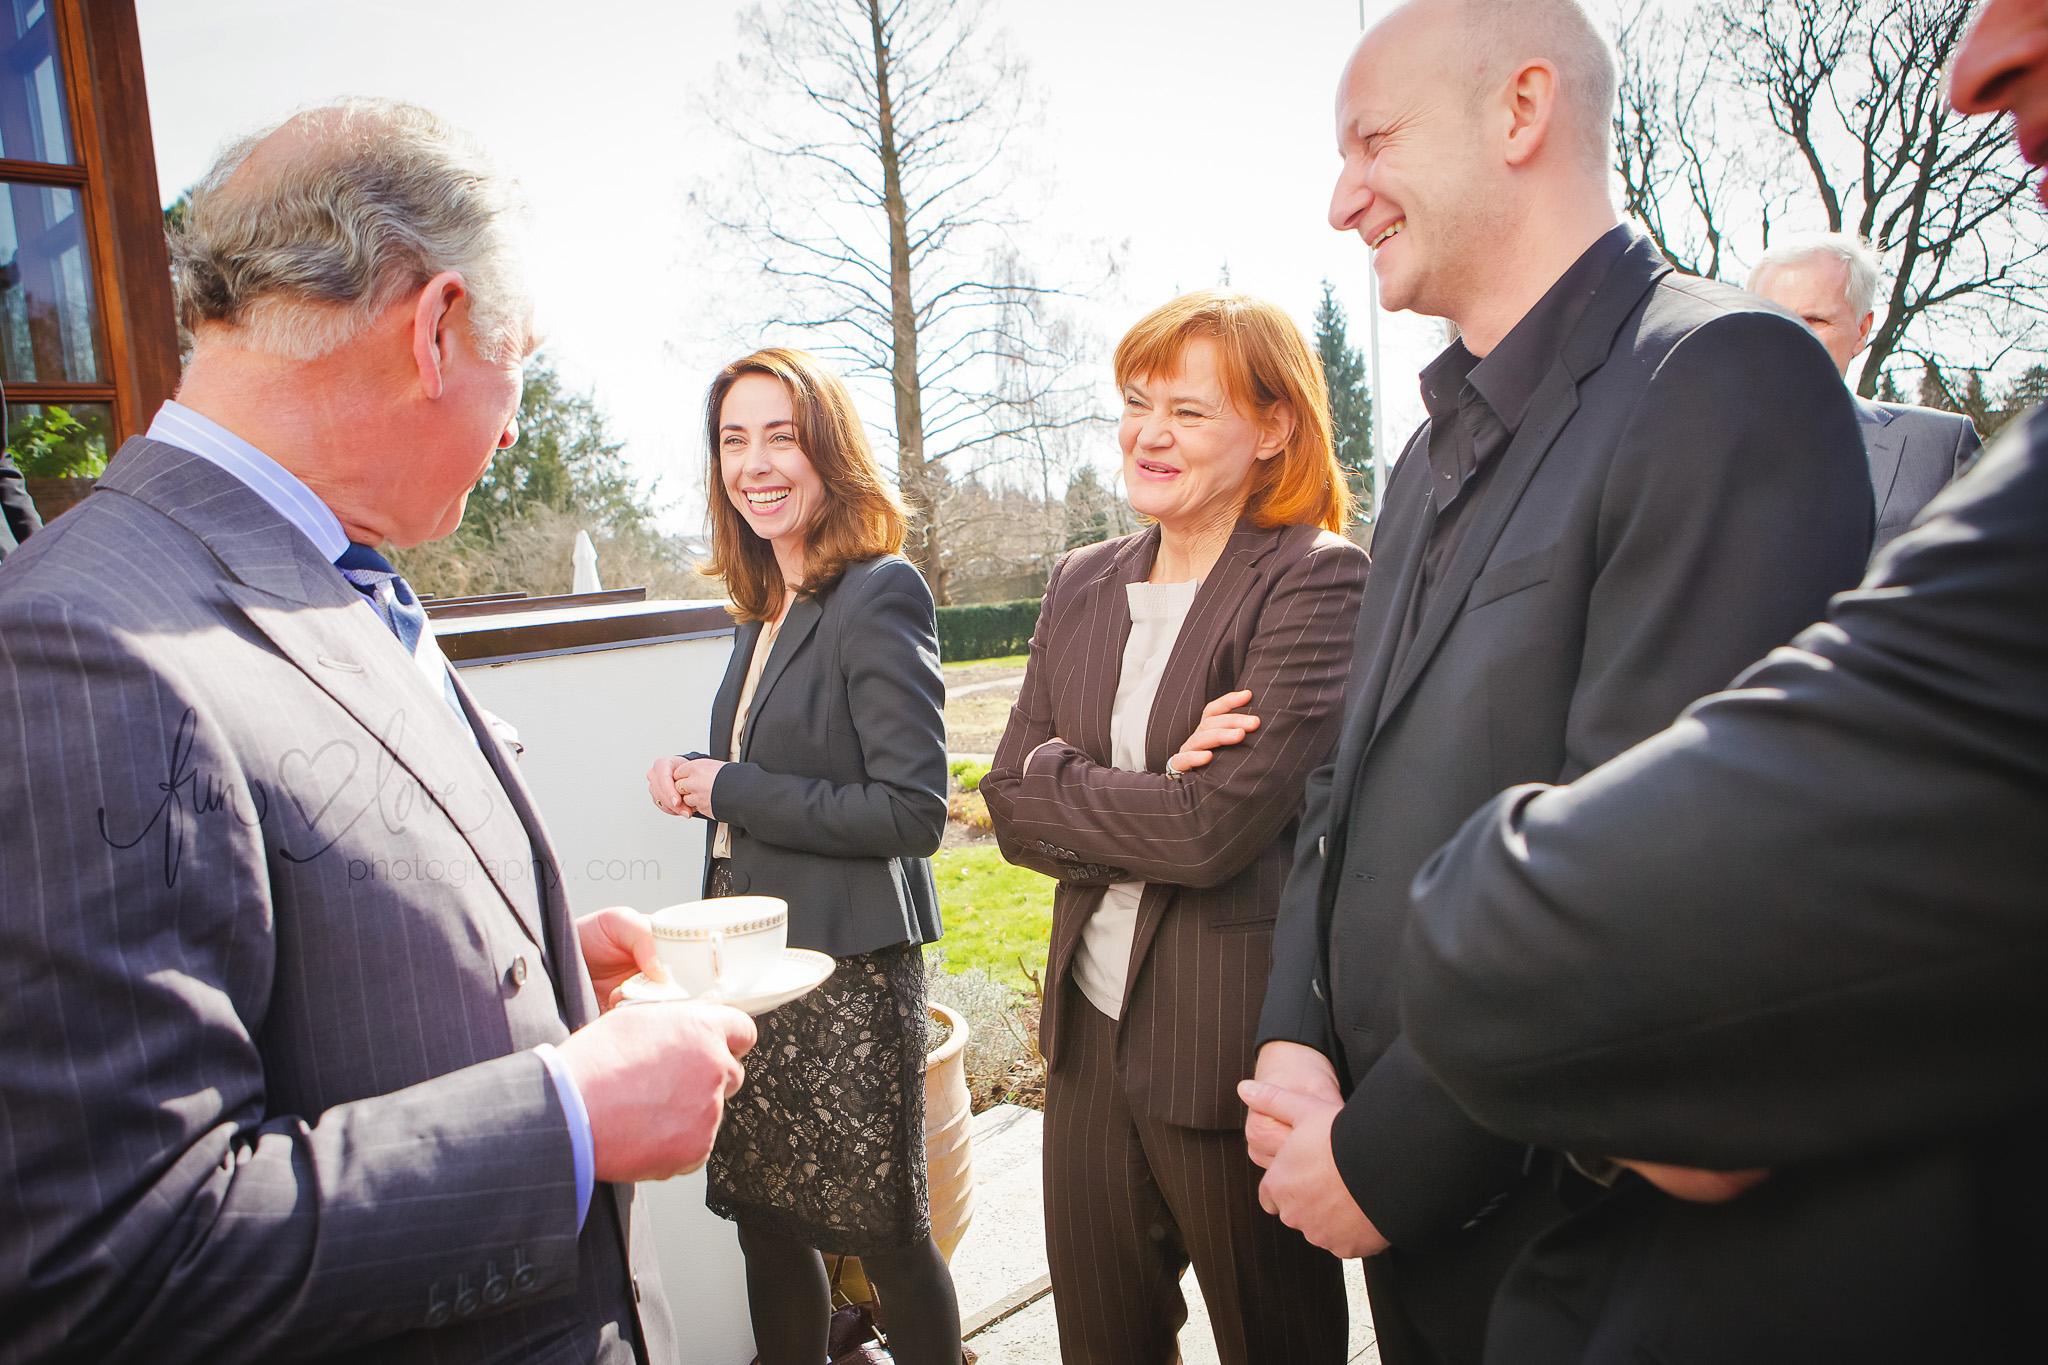 Prince Charles meets Sofie Gråbøl, Piv Bernth and Søren Sveistrup